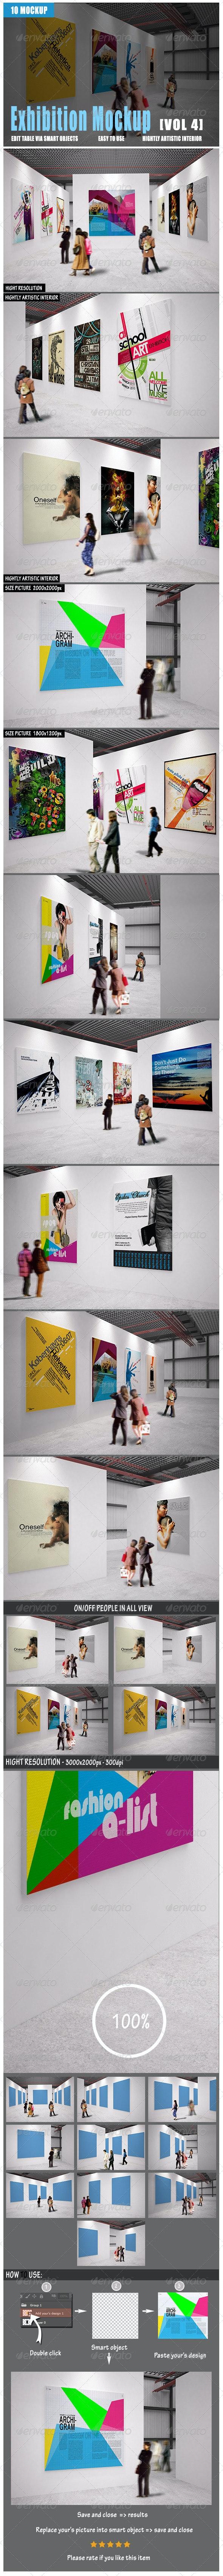 Exhibition Mockup [vol 4] - Posters Print